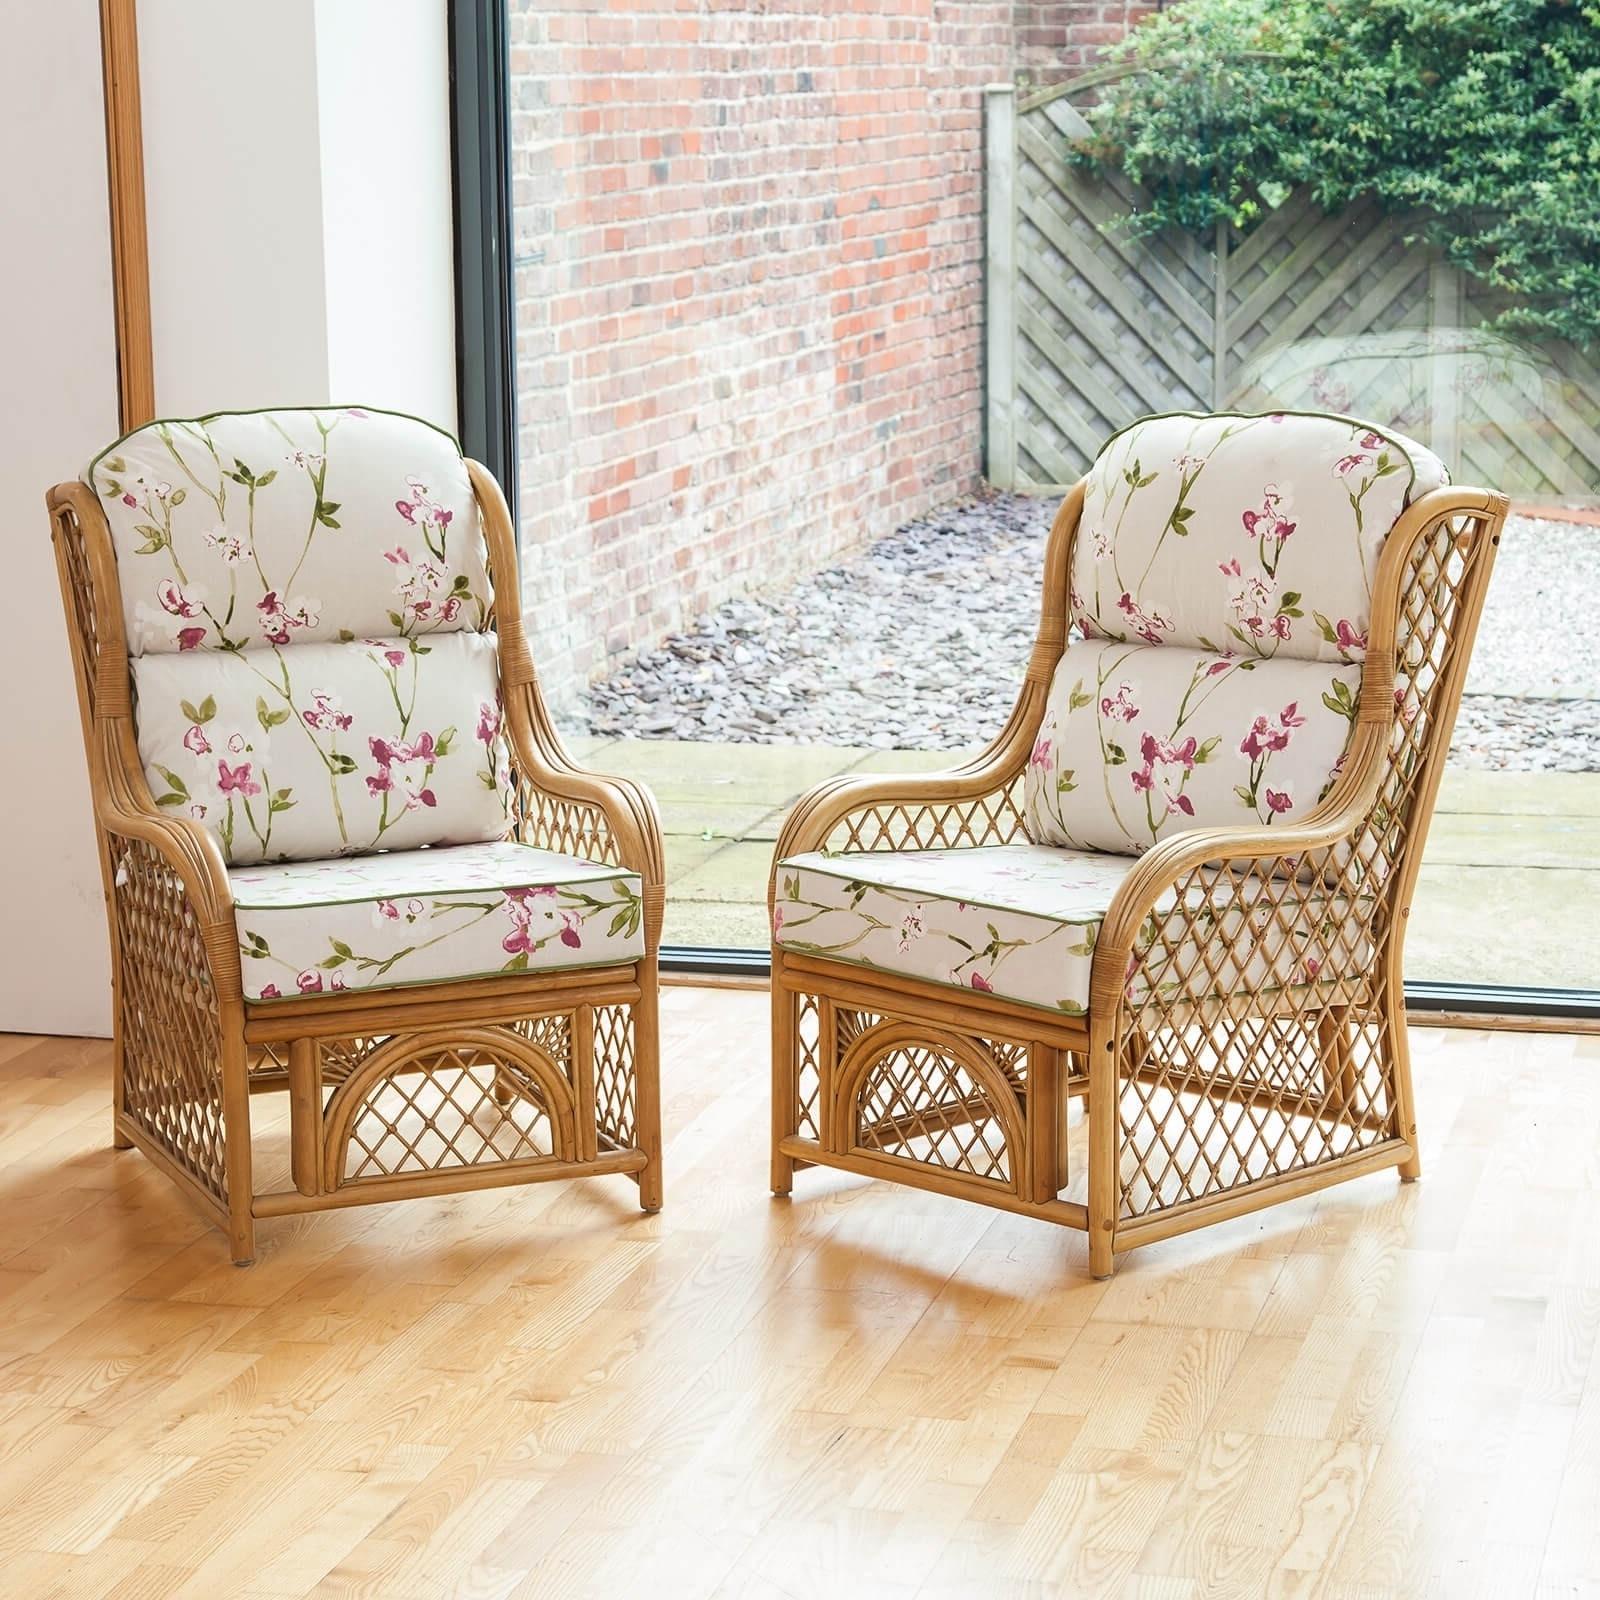 2019 Armchair : Chintz Drapes Chintz Fabricthe Yard Chintz Fabric Within Chintz Fabric Sofas (View 4 of 20)